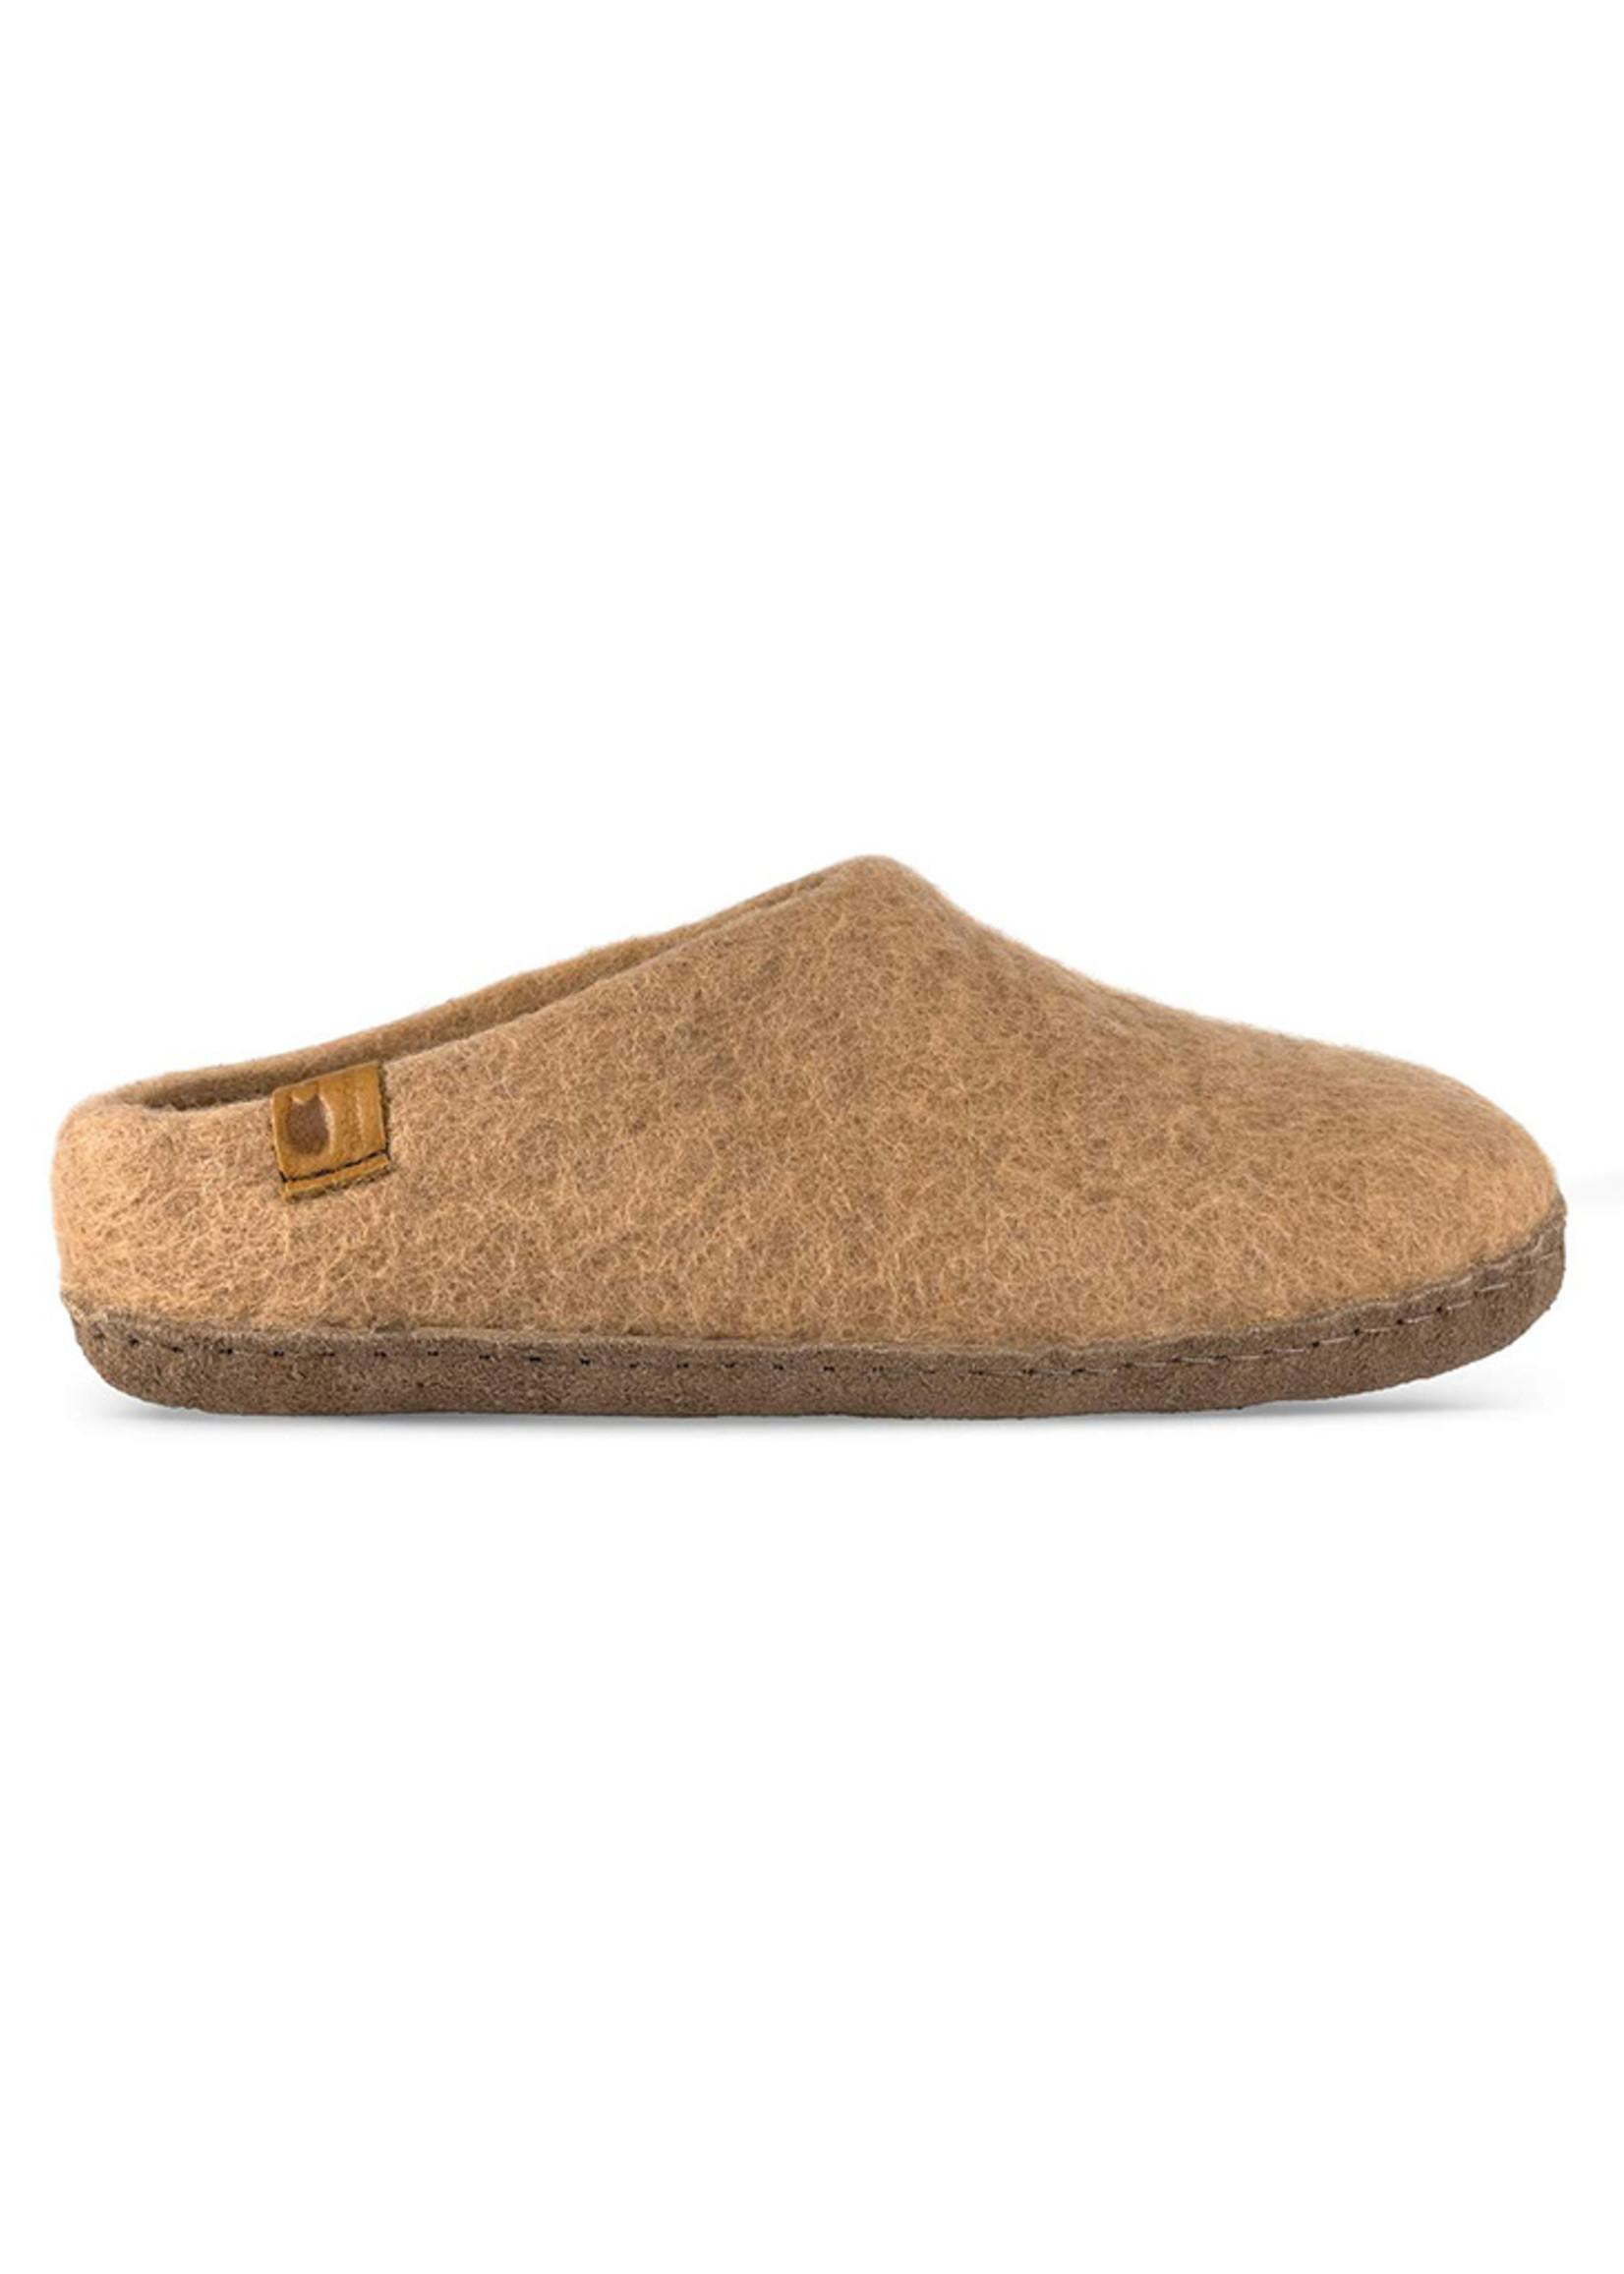 Baabushka Sand Wool Slippers